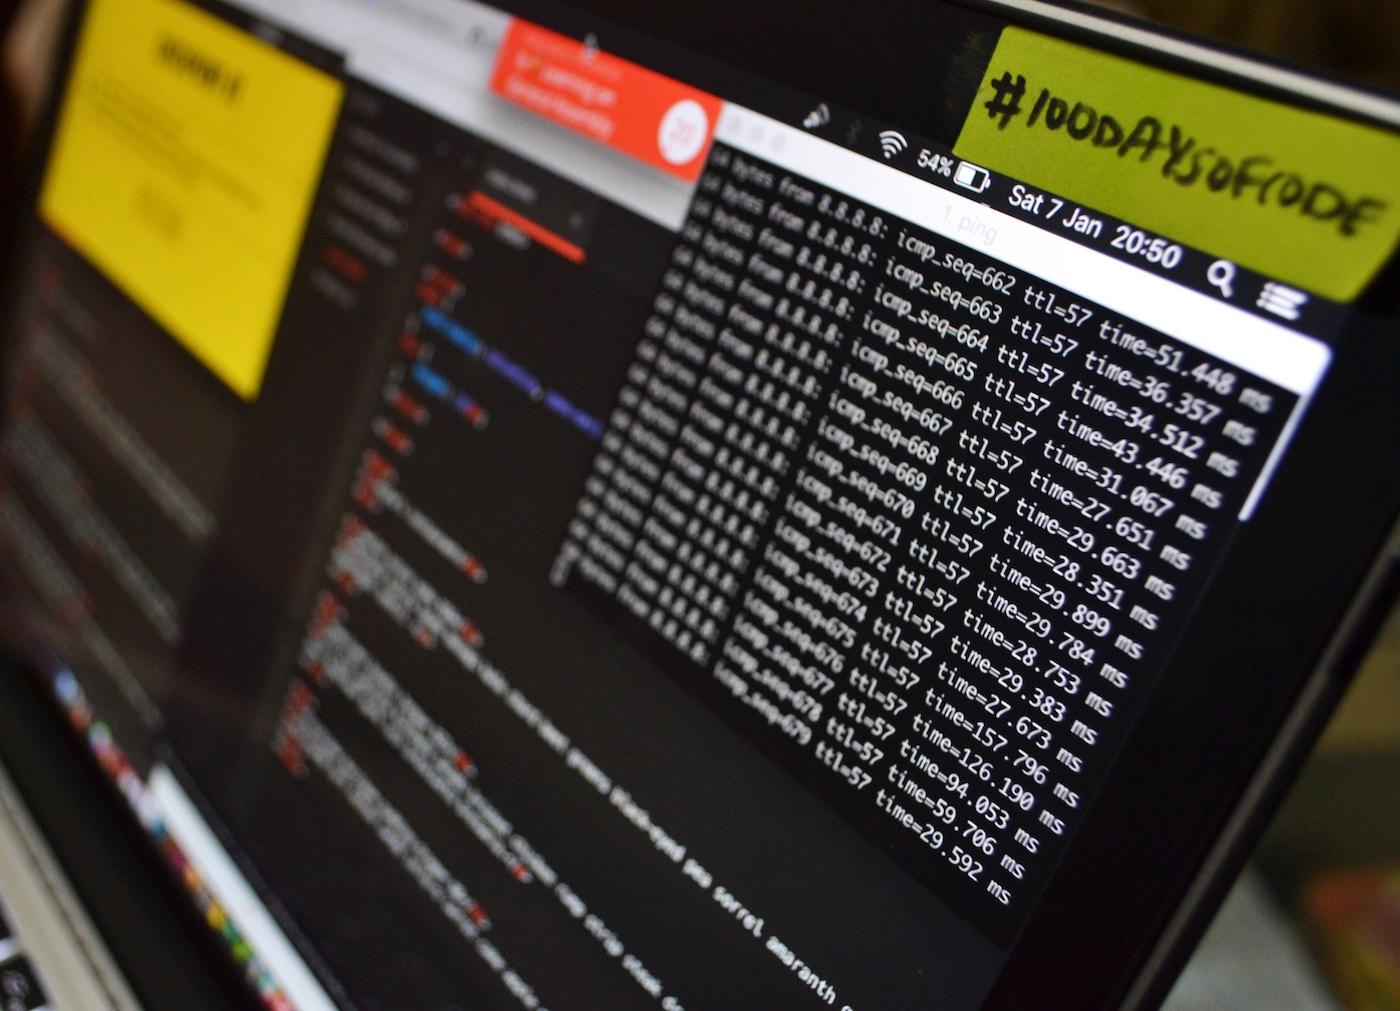 U stolyci vidbudeťsja konferencija BlockchainUA